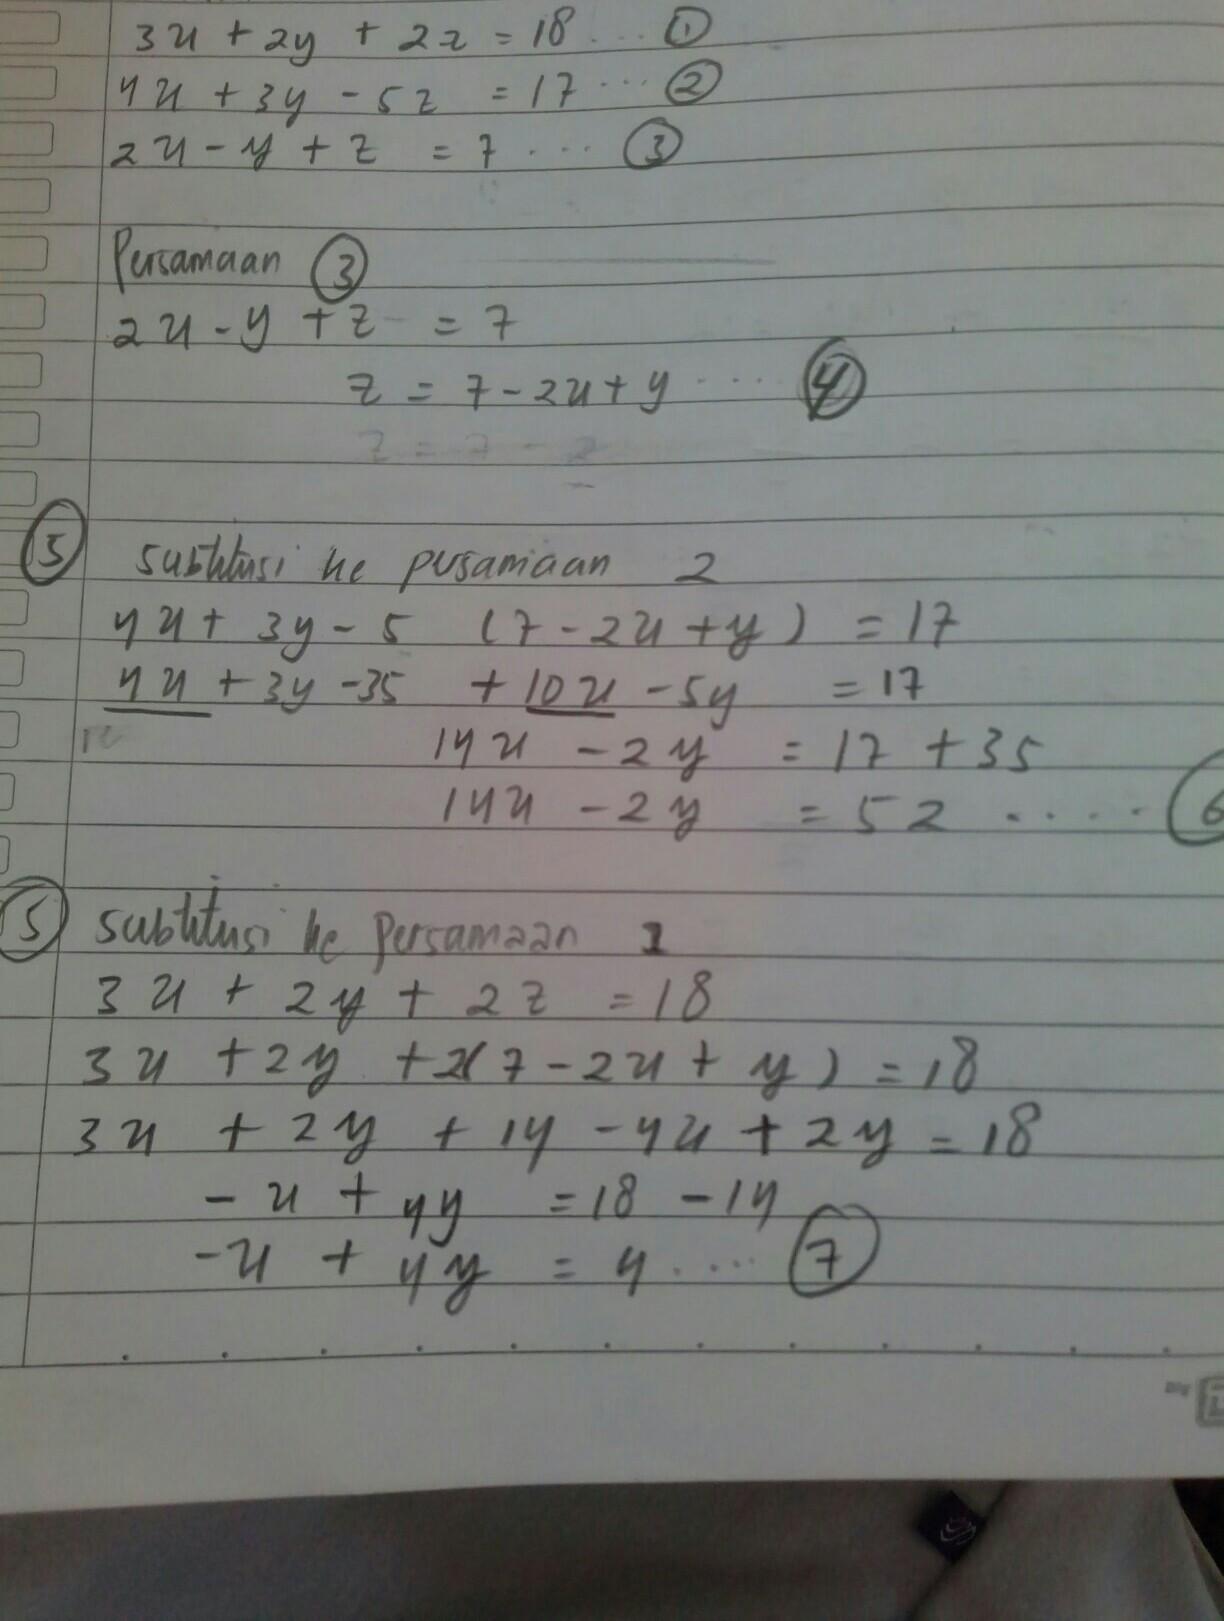 Contoh Soal Persamaan Linear Tiga Variabel : contoh, persamaan, linear, variabel, Buatkan, Contoh, Sistem, Persamaan, Linear, Variabel, Beserta, Penyelesaiannya, Brainly.co.id